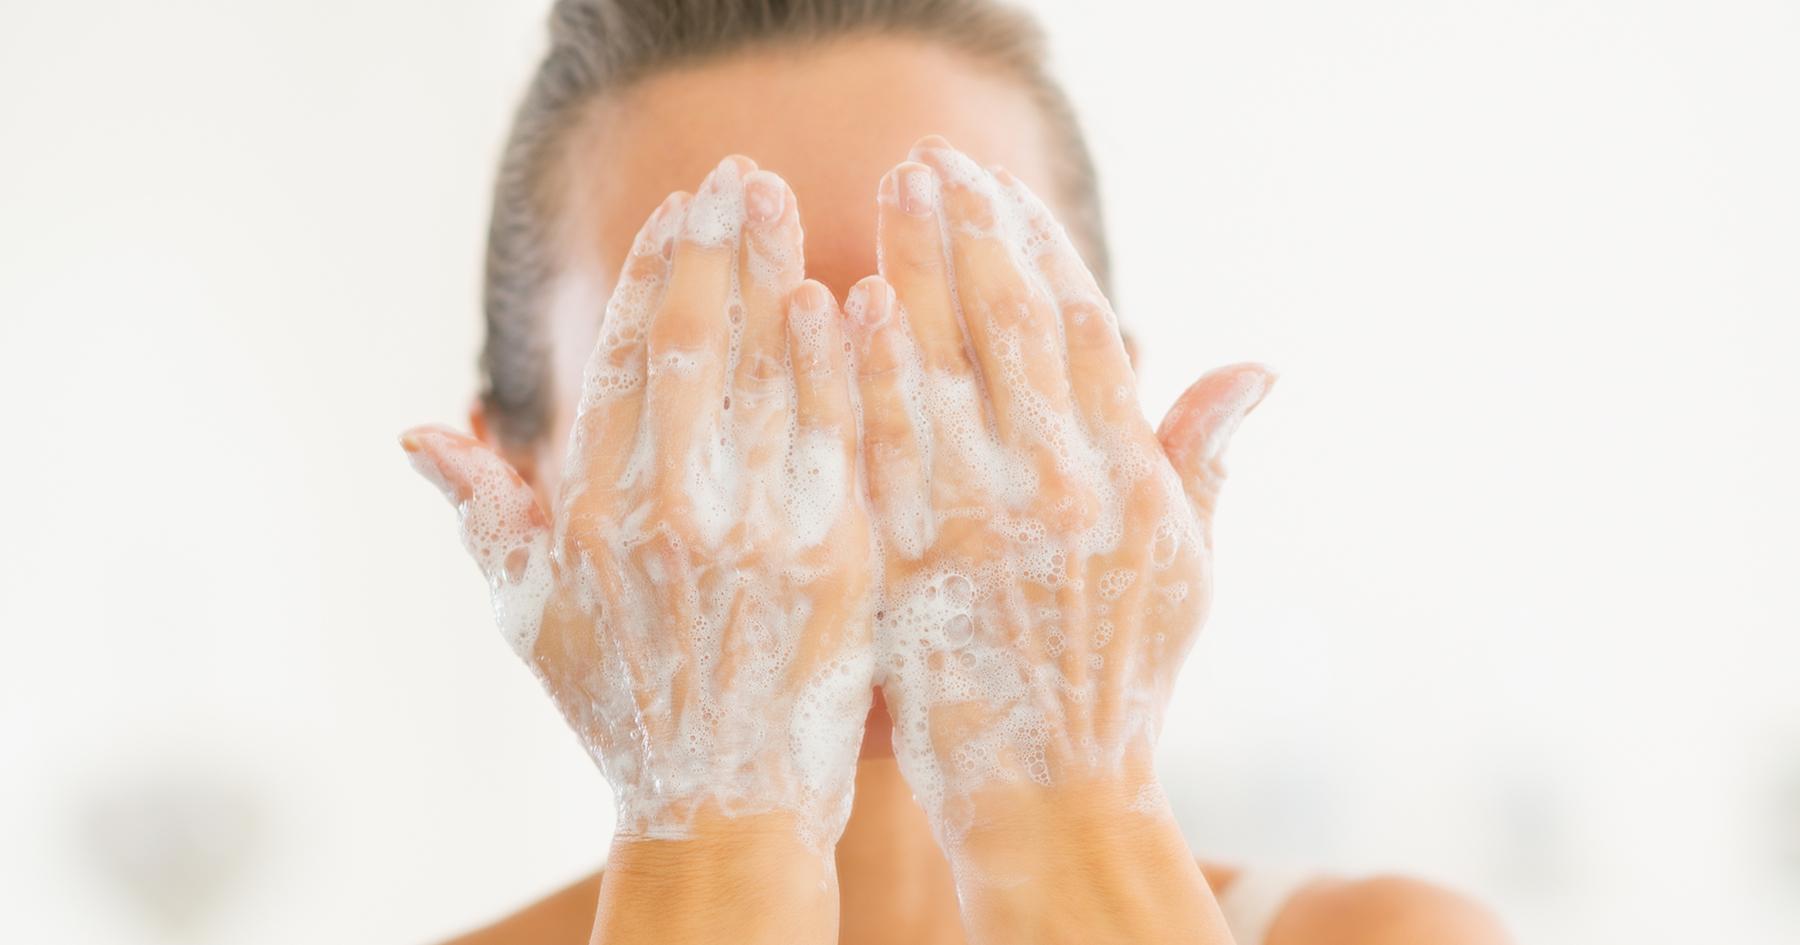 microbeads in cosmetics